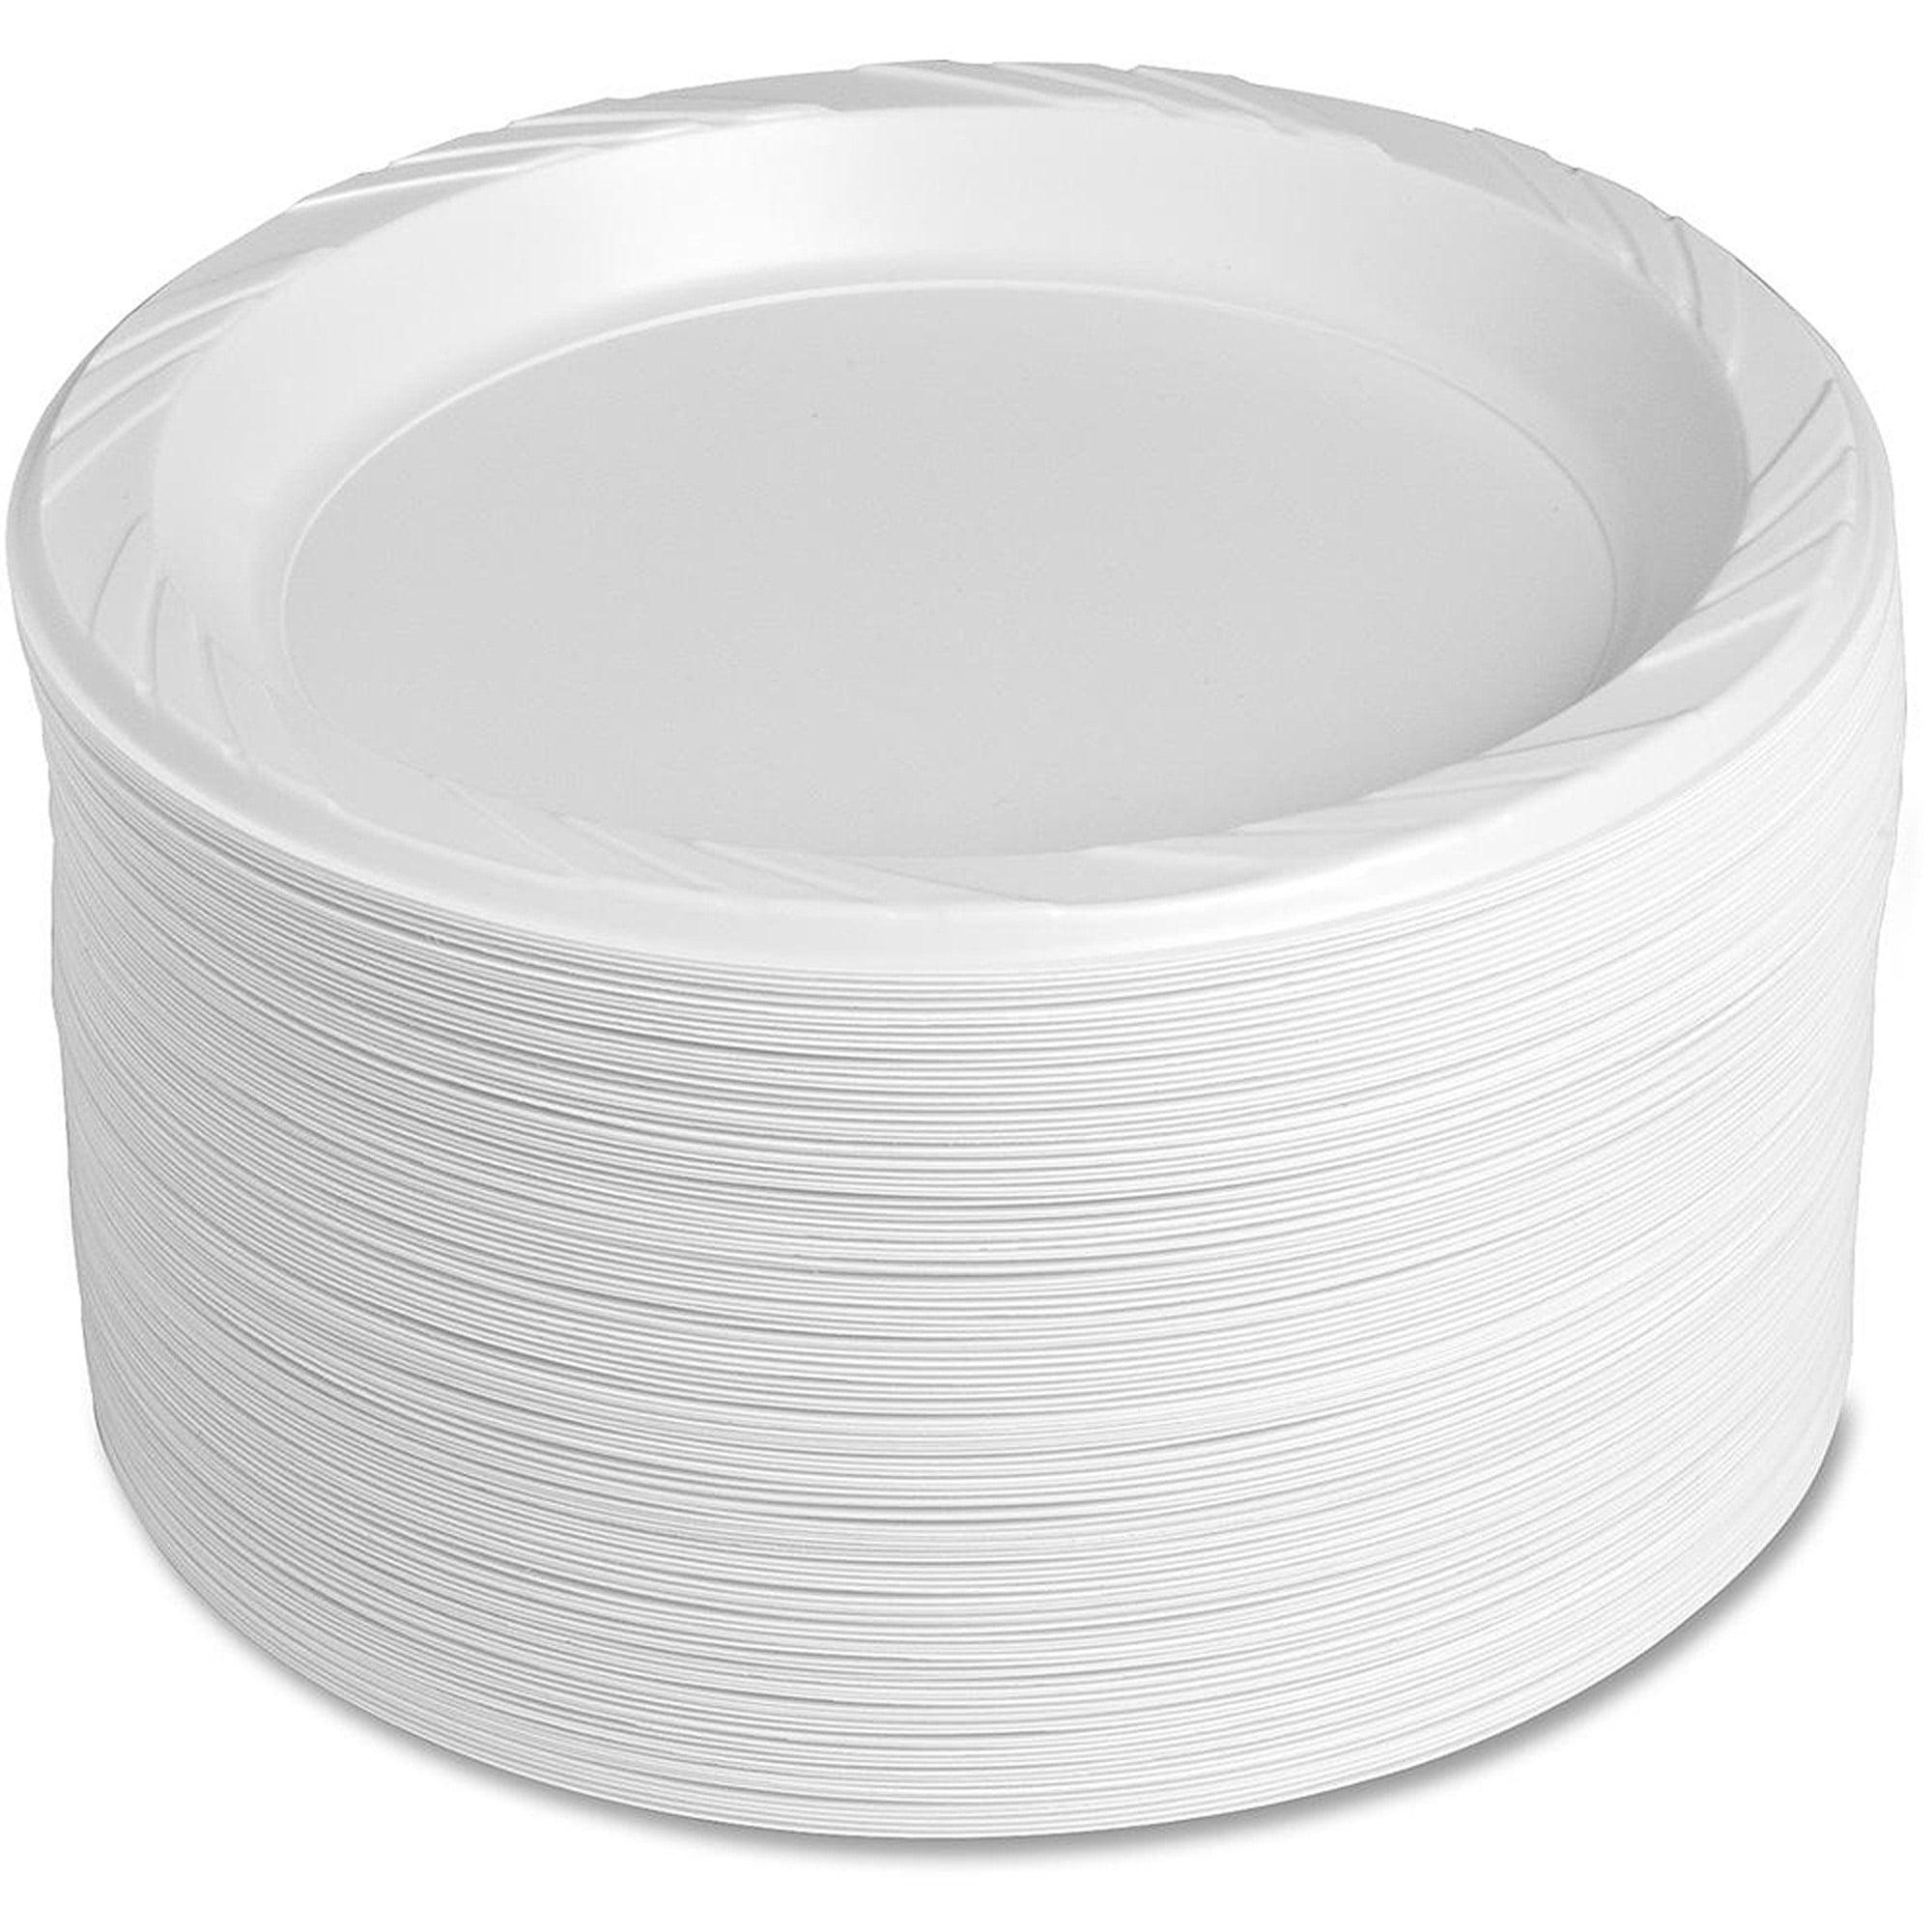 Genuine Joe Reusable Plastic Plates White 9  125 pack GJO10329 - Walmart .com  sc 1 st  Walmart & Genuine Joe Reusable Plastic Plates White 9